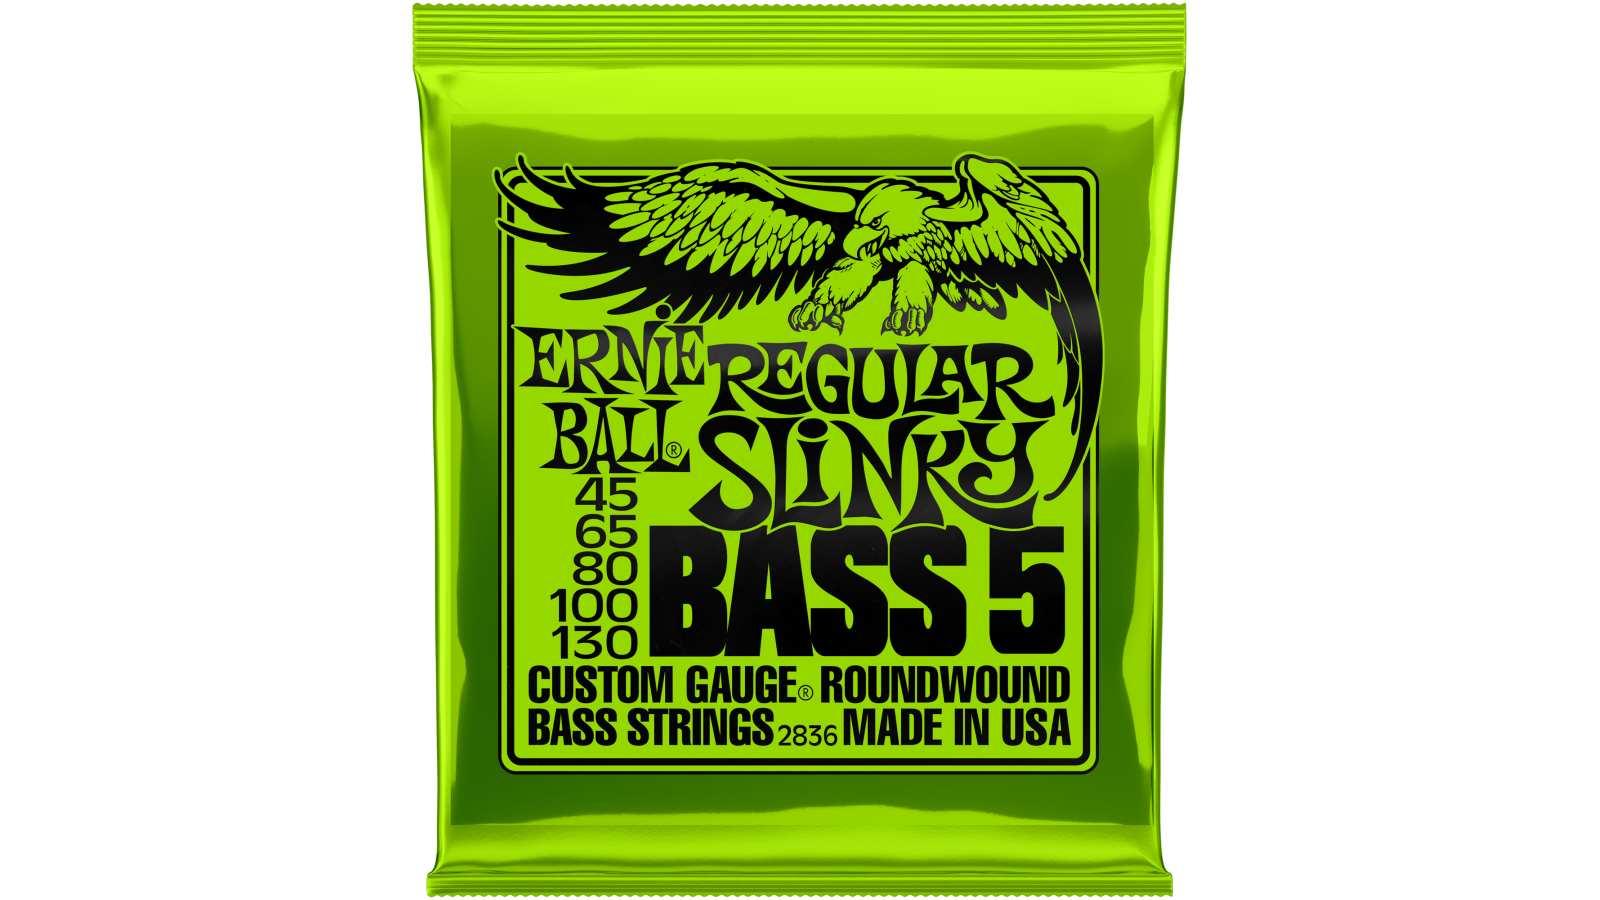 Ernie Ball EB-2836 5-String Slinky Bass Saiten 45-130